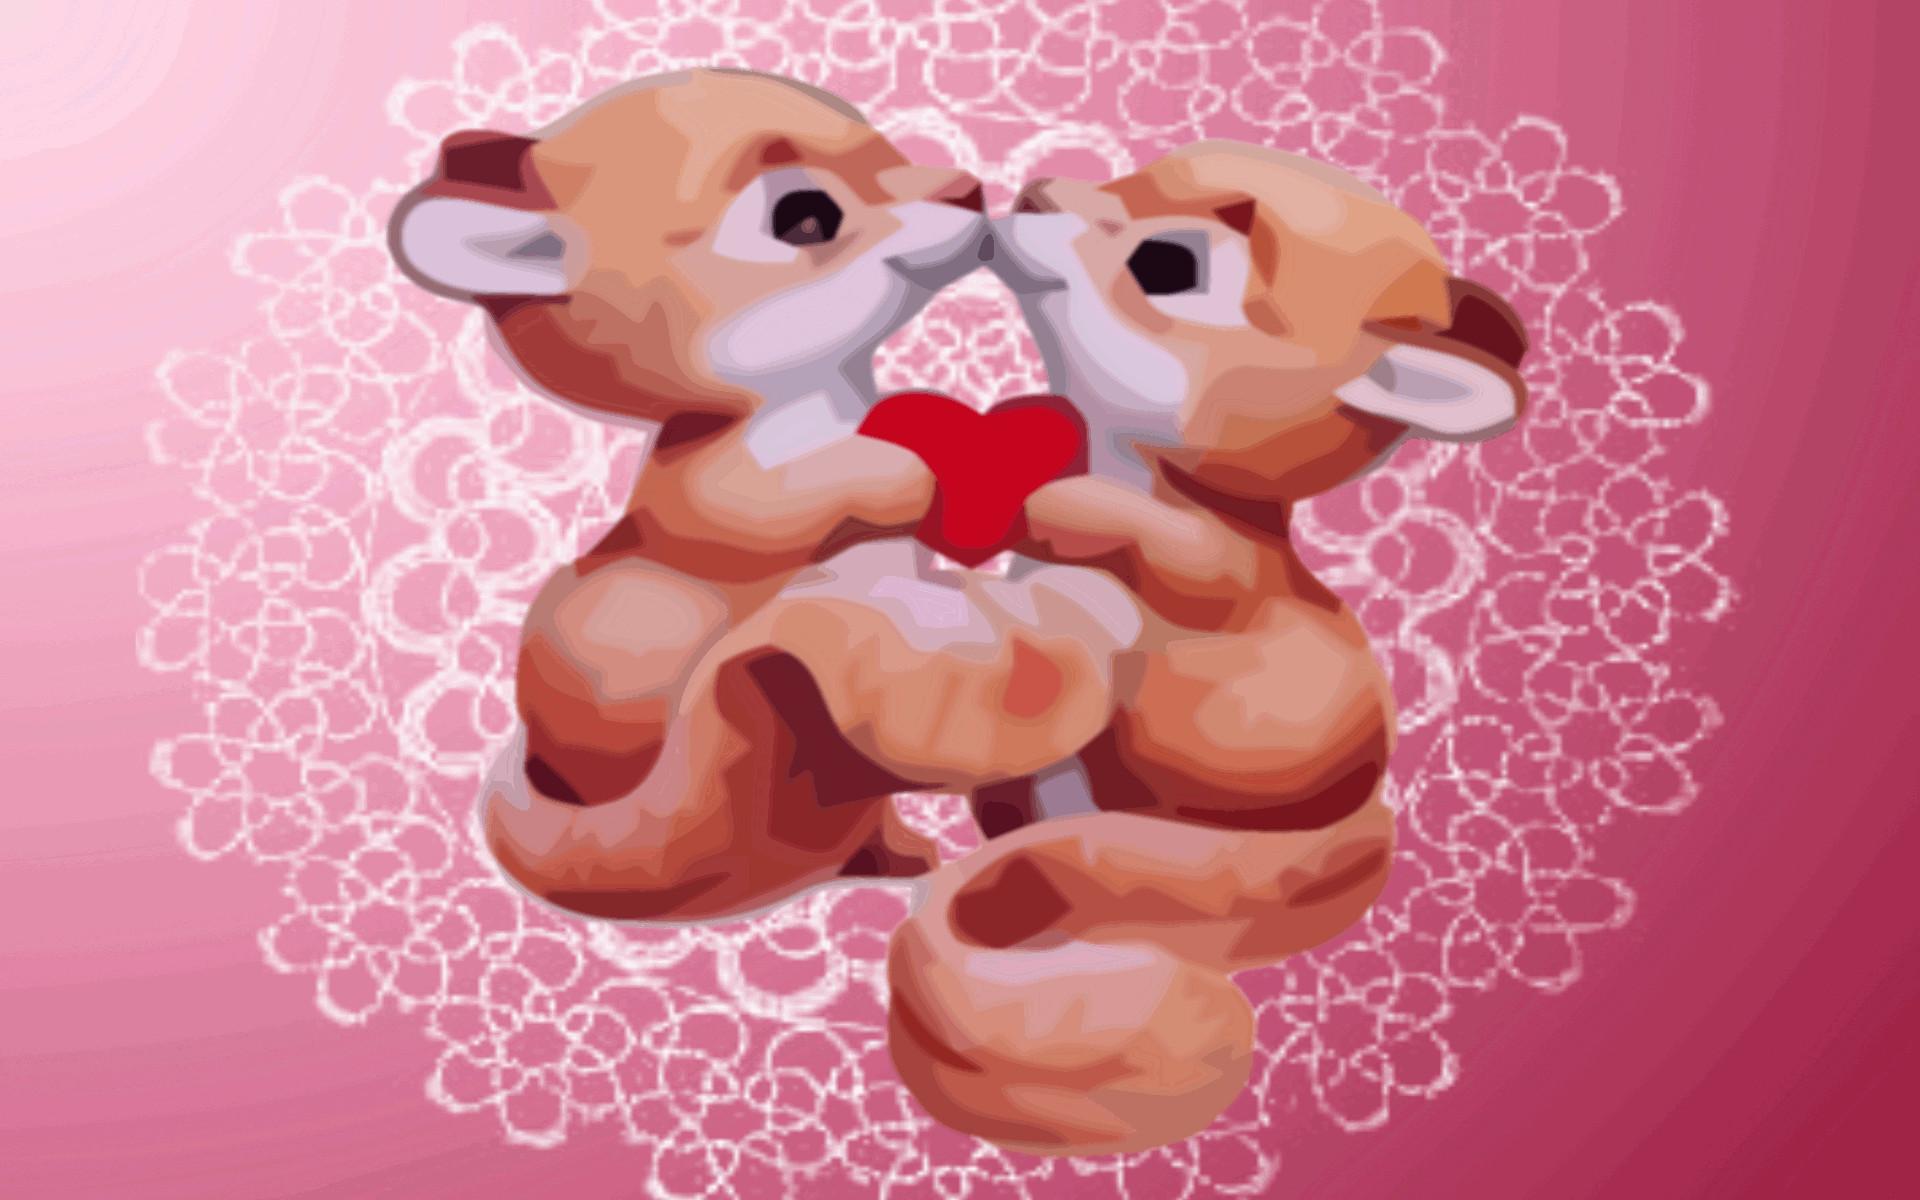 Картинка всех с днем валентина